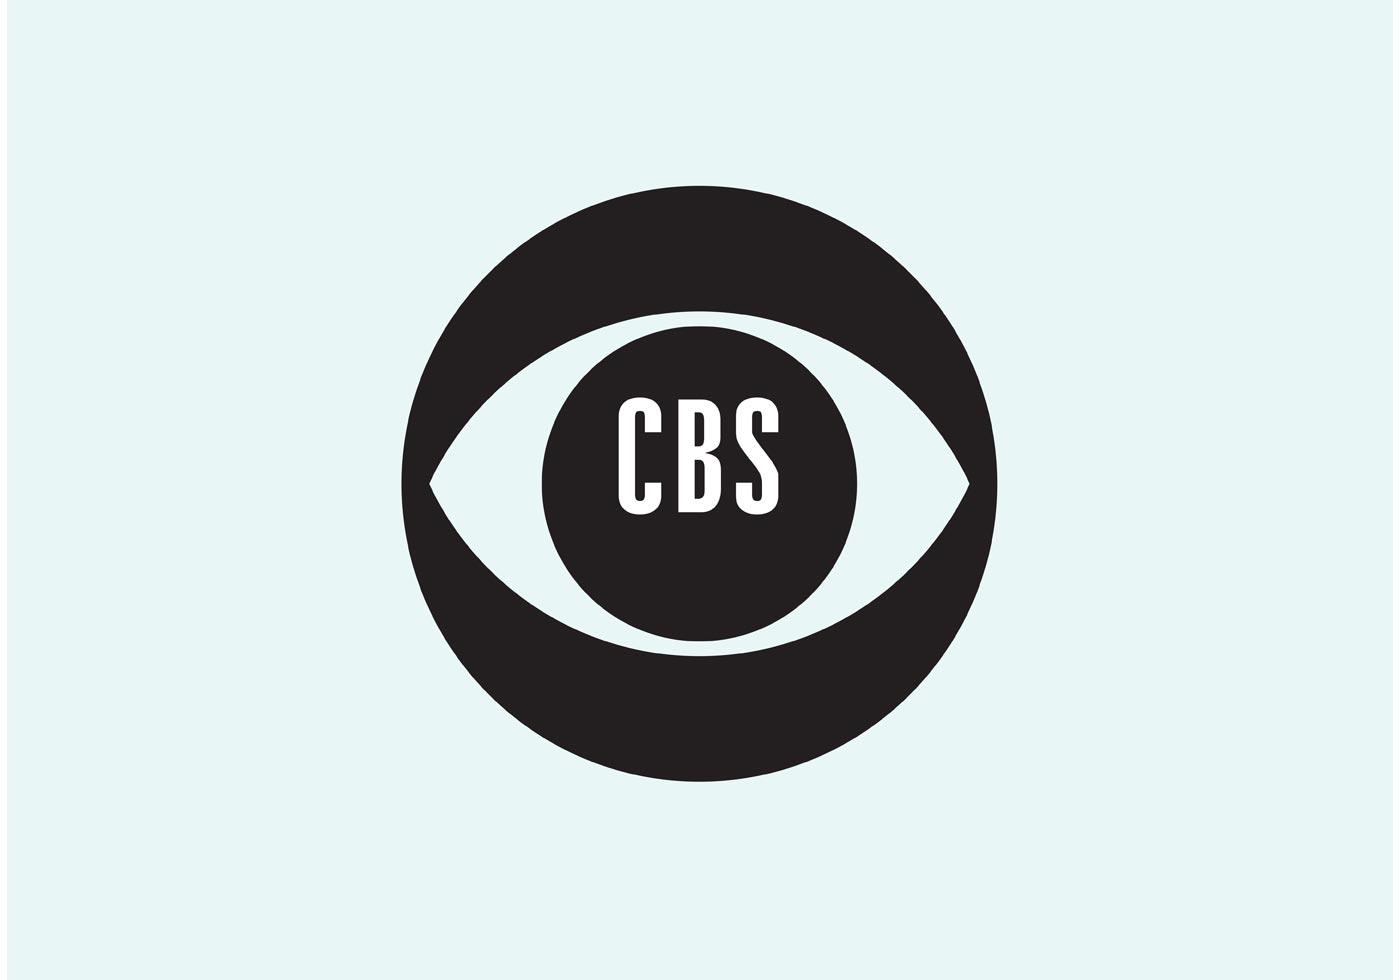 CBS Vector Logo - Download Free Vector Art, Stock Graphics ... Cbs News Logo Vector